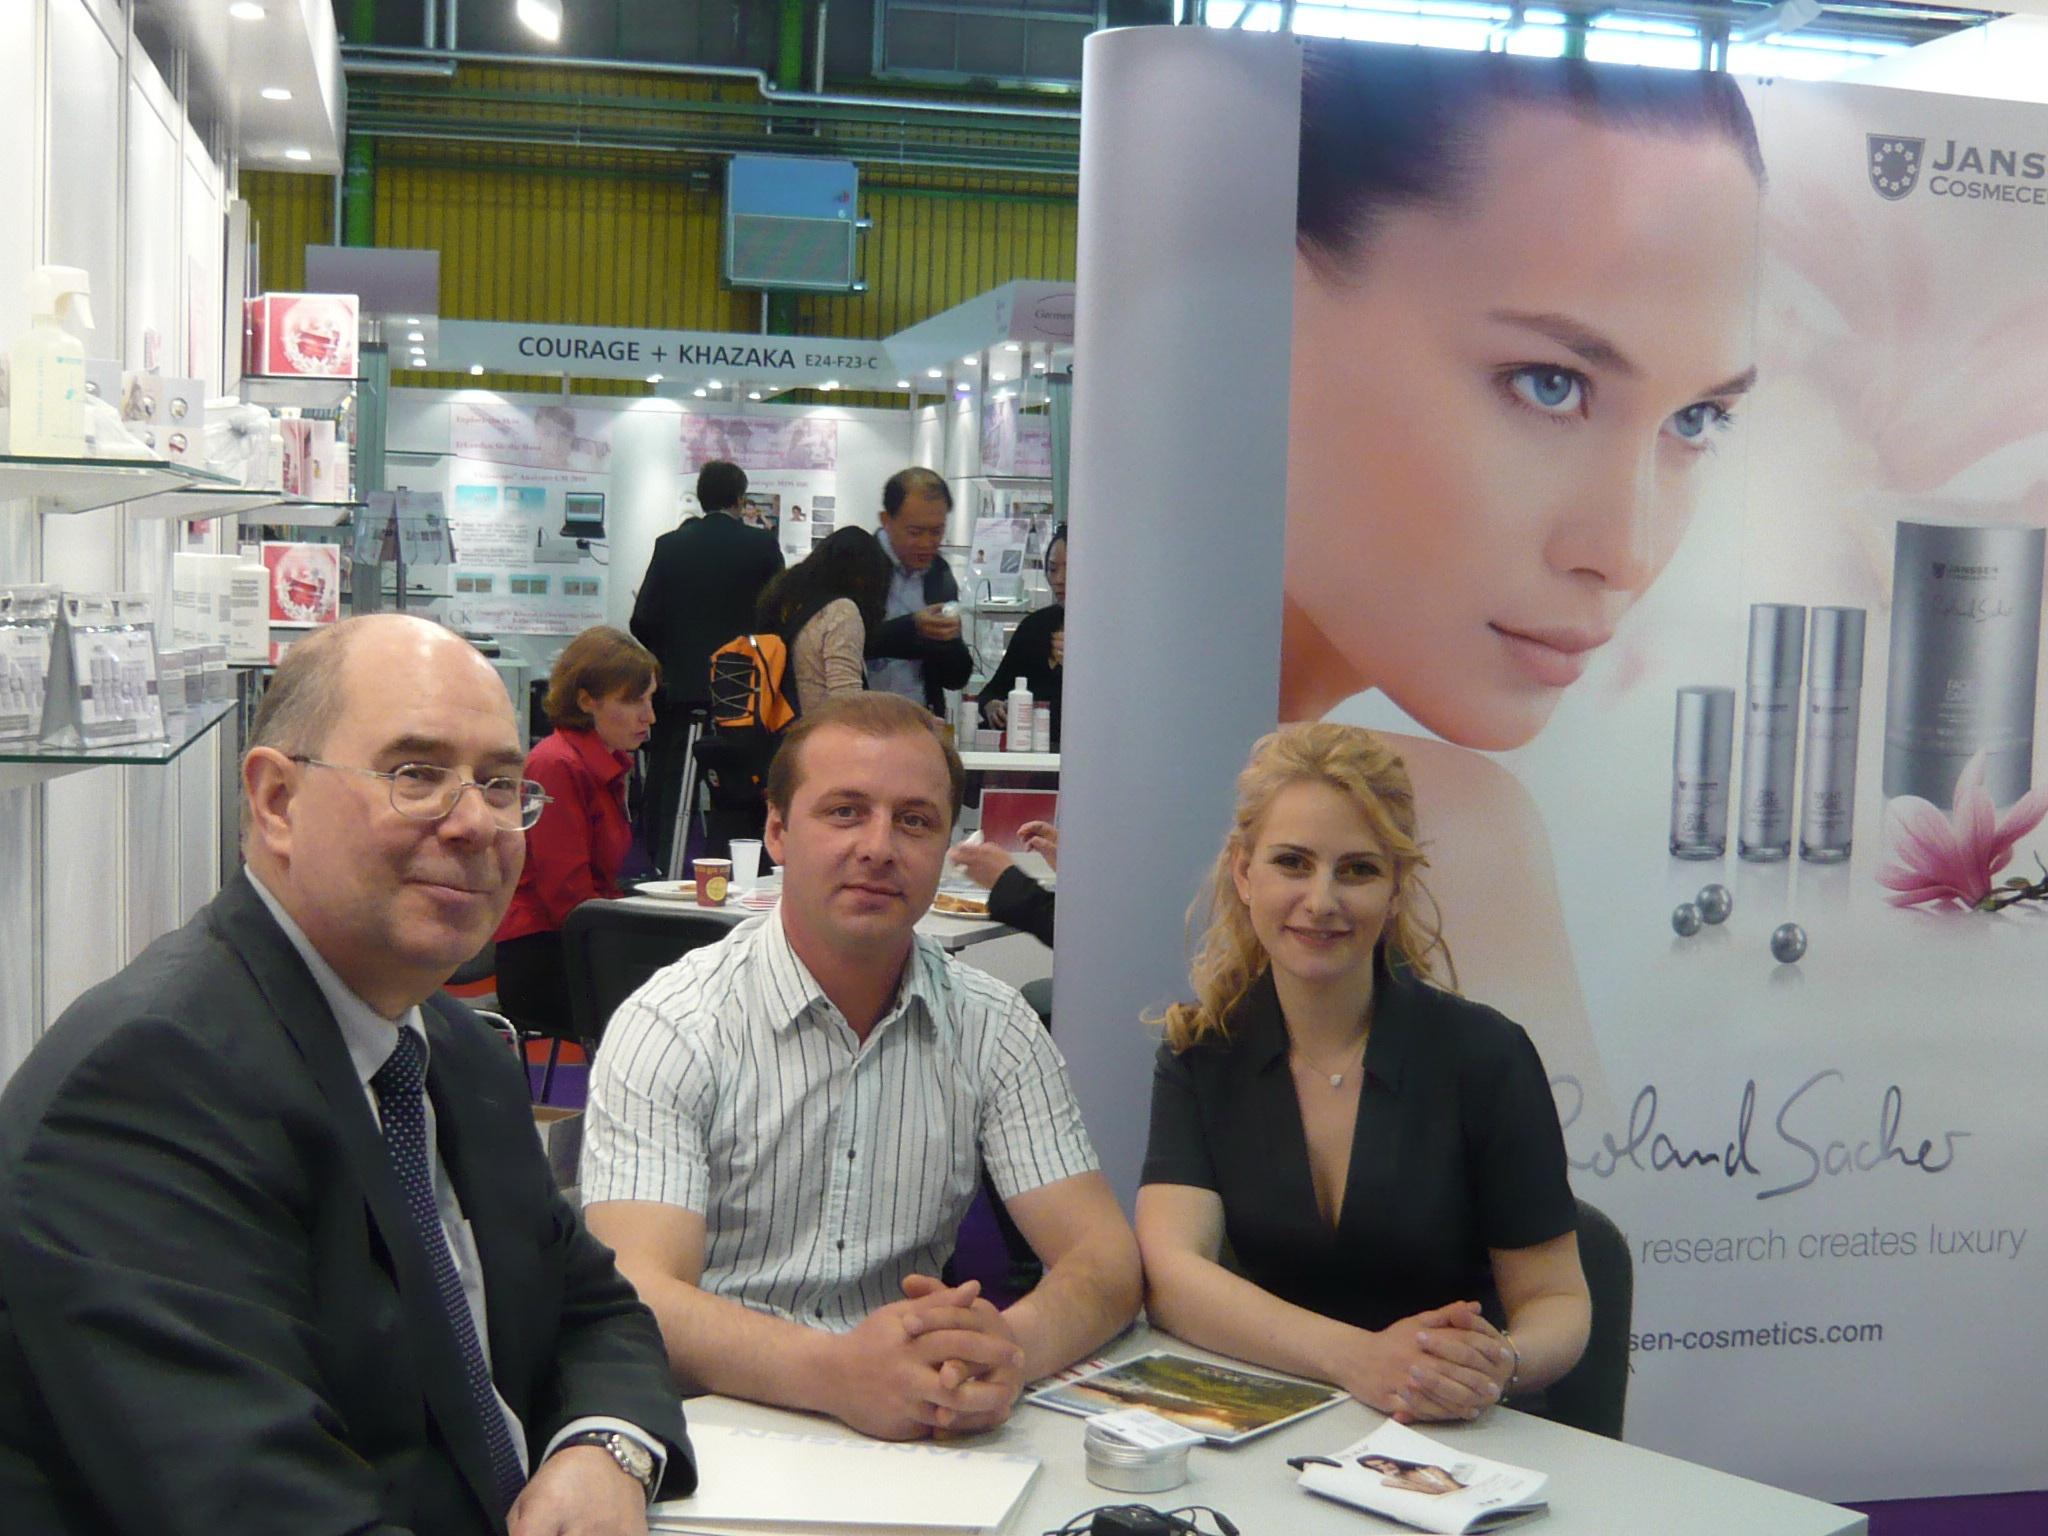 Gäste in Bologna - Cosmoprof 2010